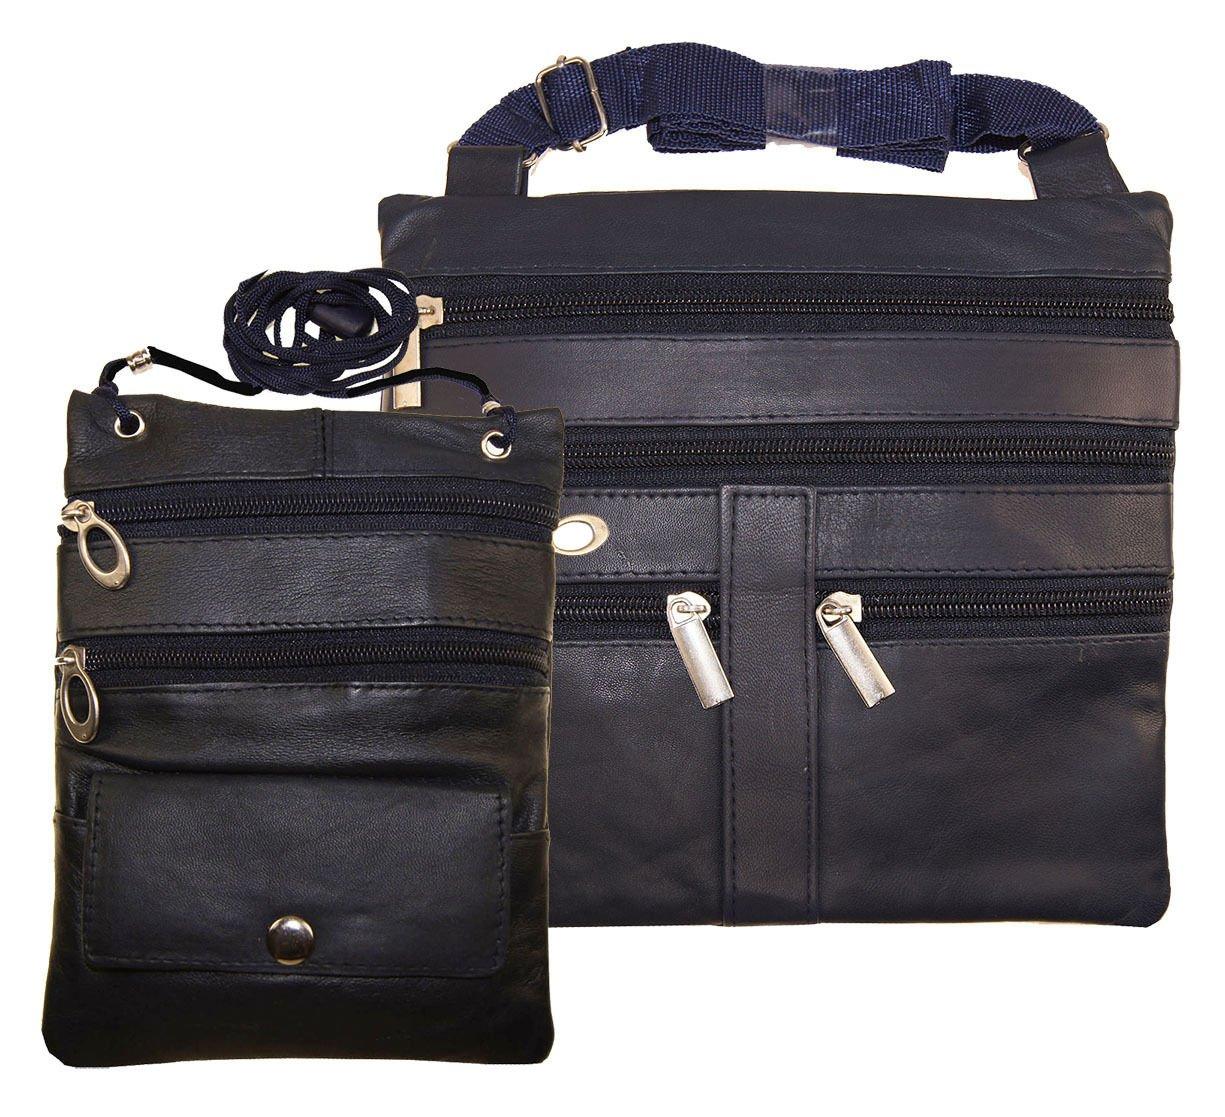 1 Lady 2 Navy Blue Cross Body Leather Satchel Messenger Bag 48'' Strap Pouch